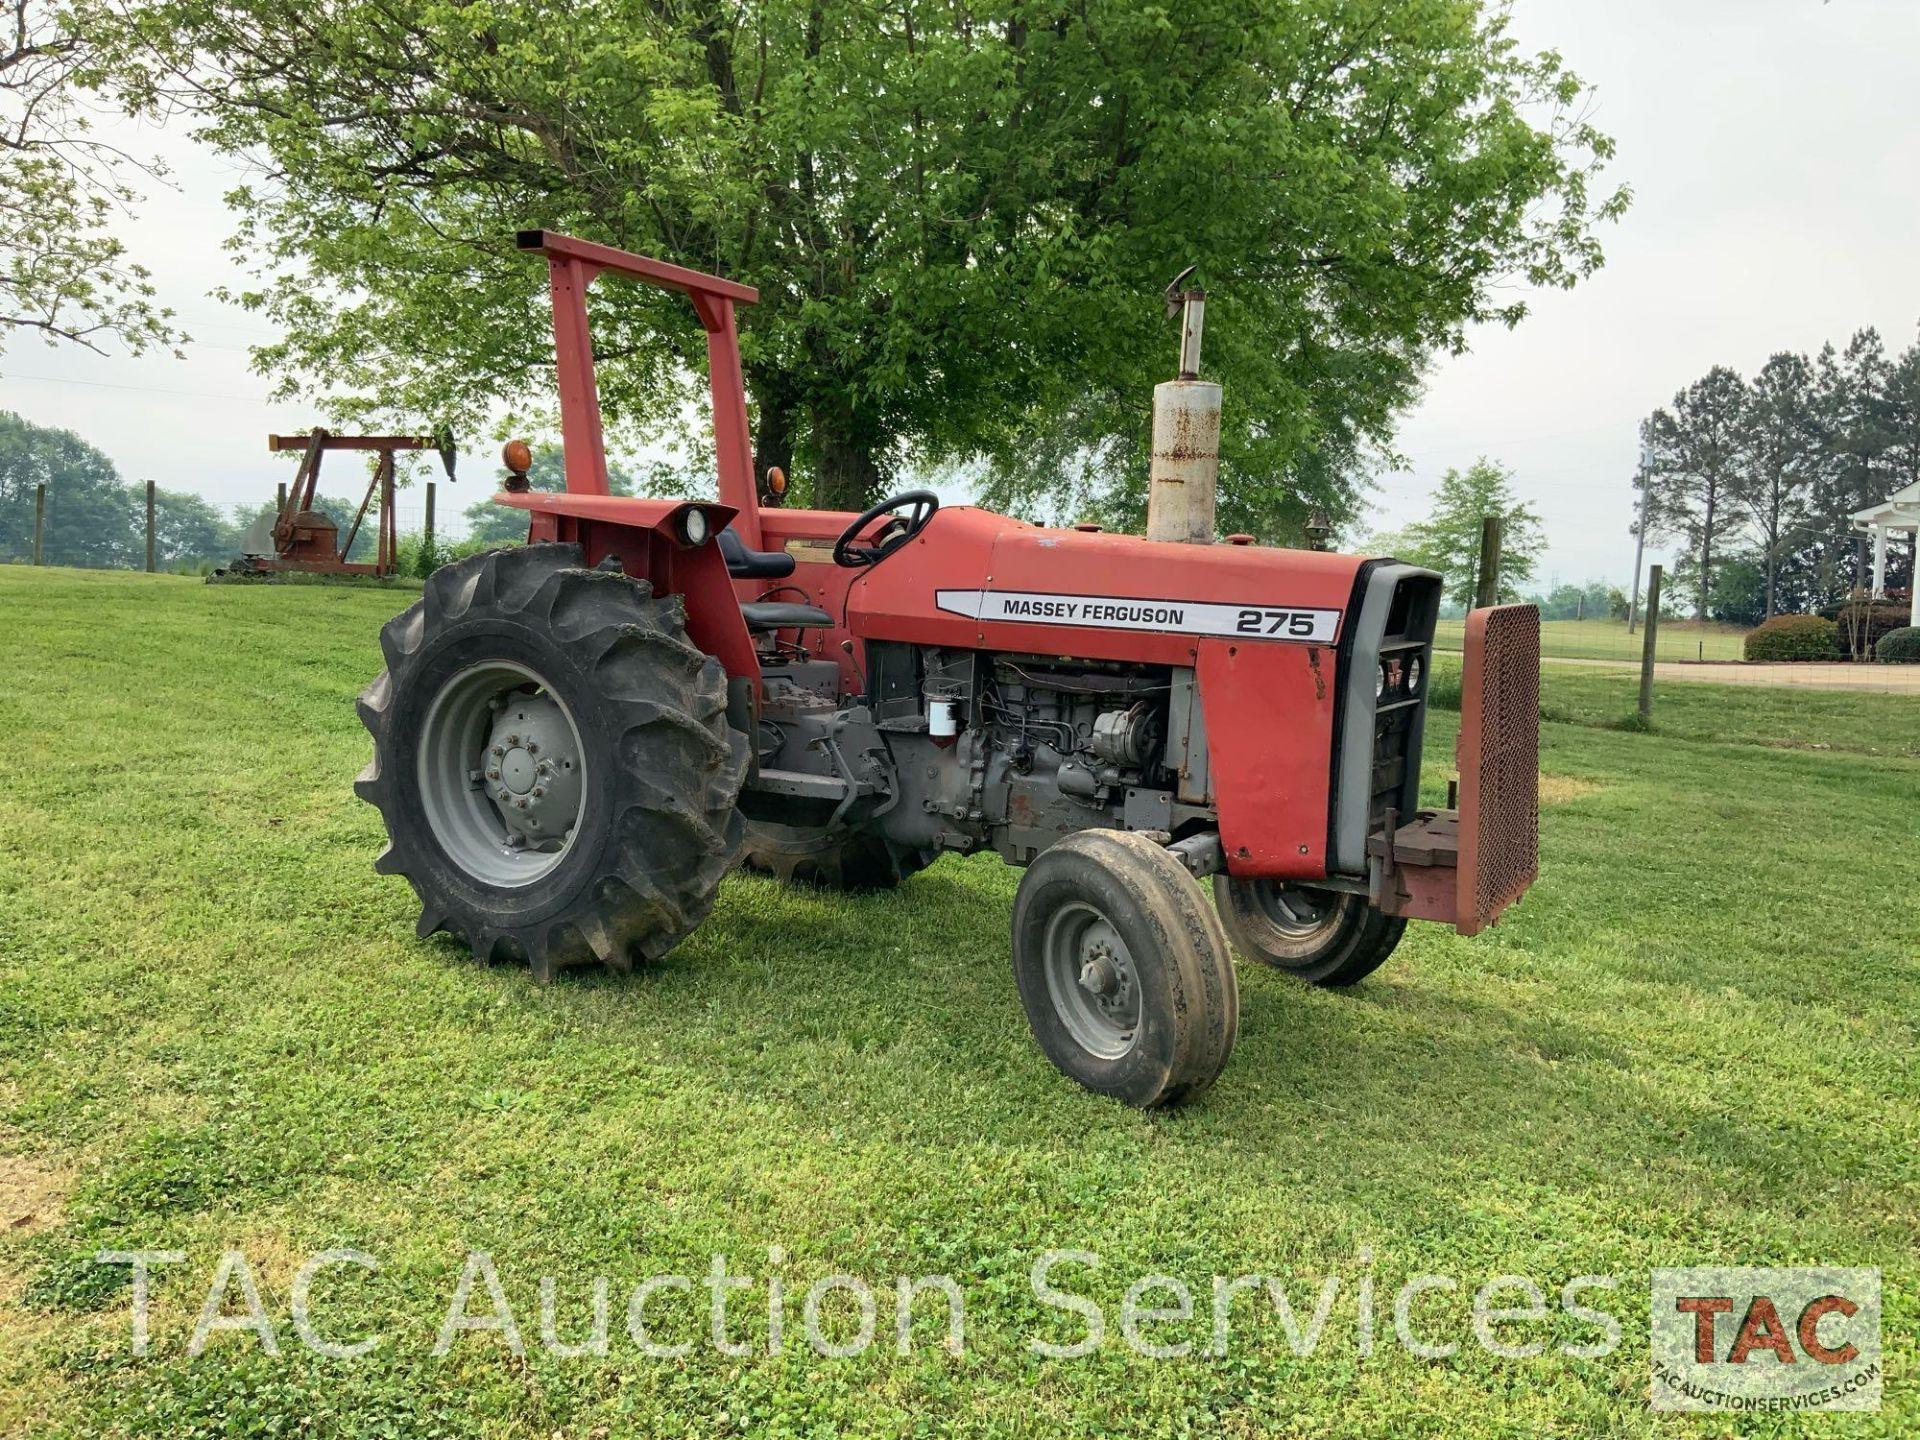 Massey Ferguson 275 Farm Tractor - Image 5 of 25